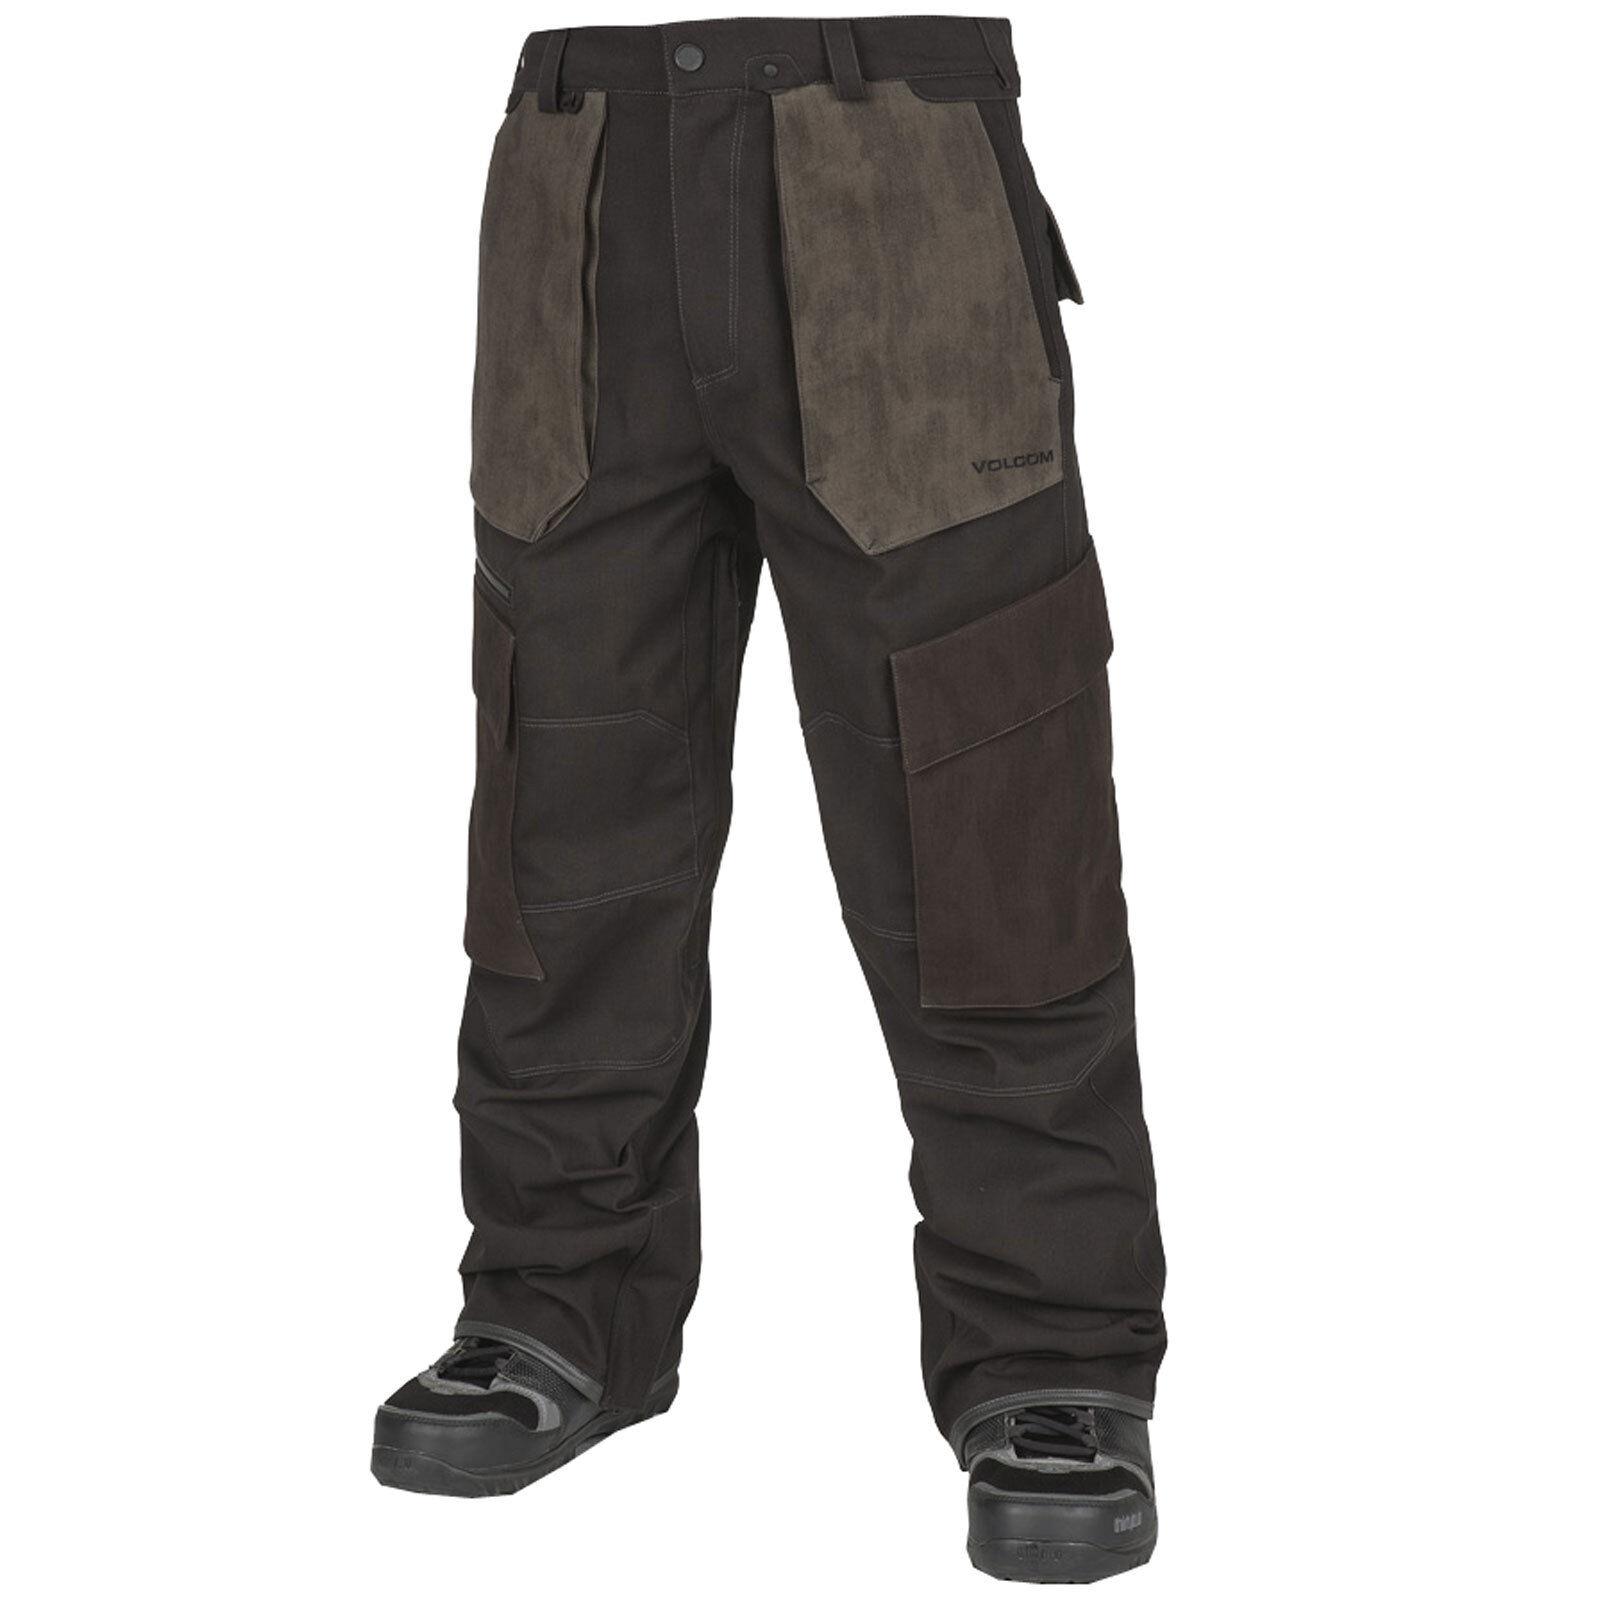 Volcom Trousers Seventy Fives Pant Uomo Snowboard Trousers Volcom Ski Snow Winter Nuovo e81c45